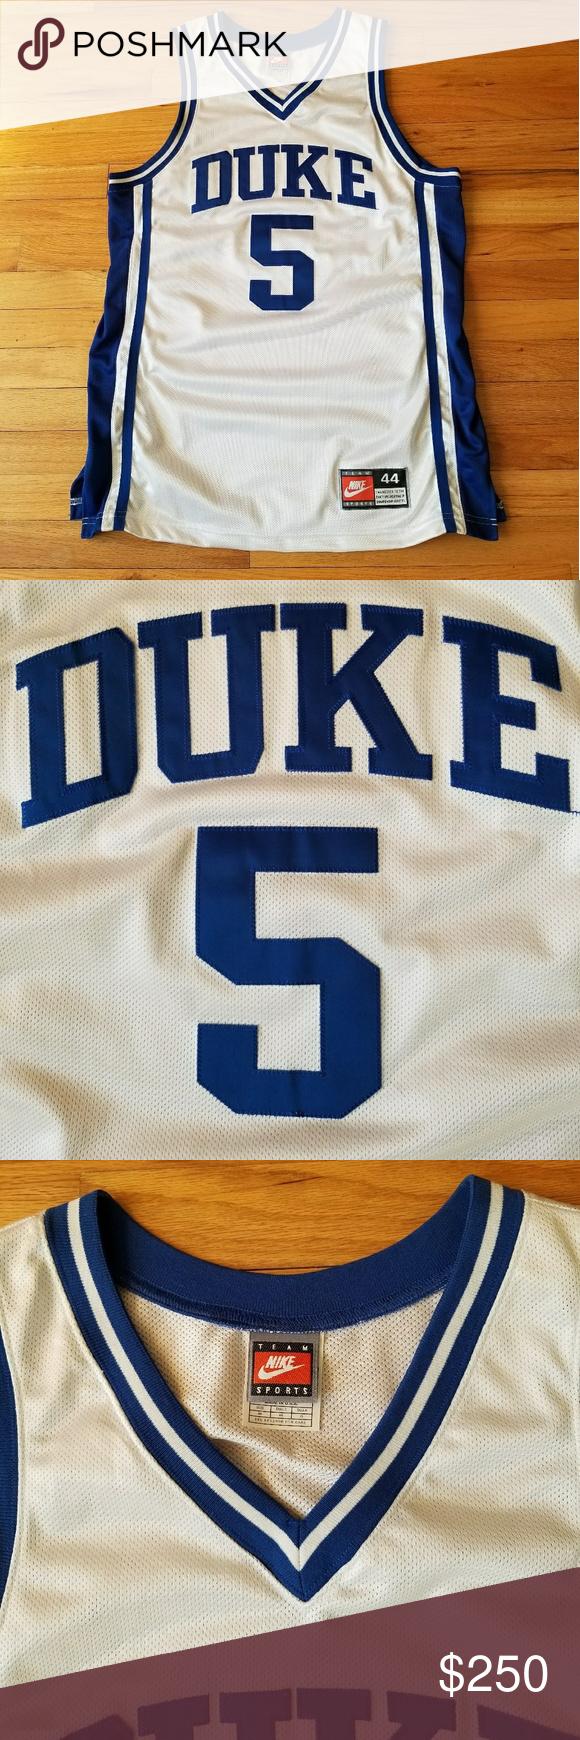 7eabdd32355 Nike Duke Team-Issued Vintage Basketball Jersey A rare